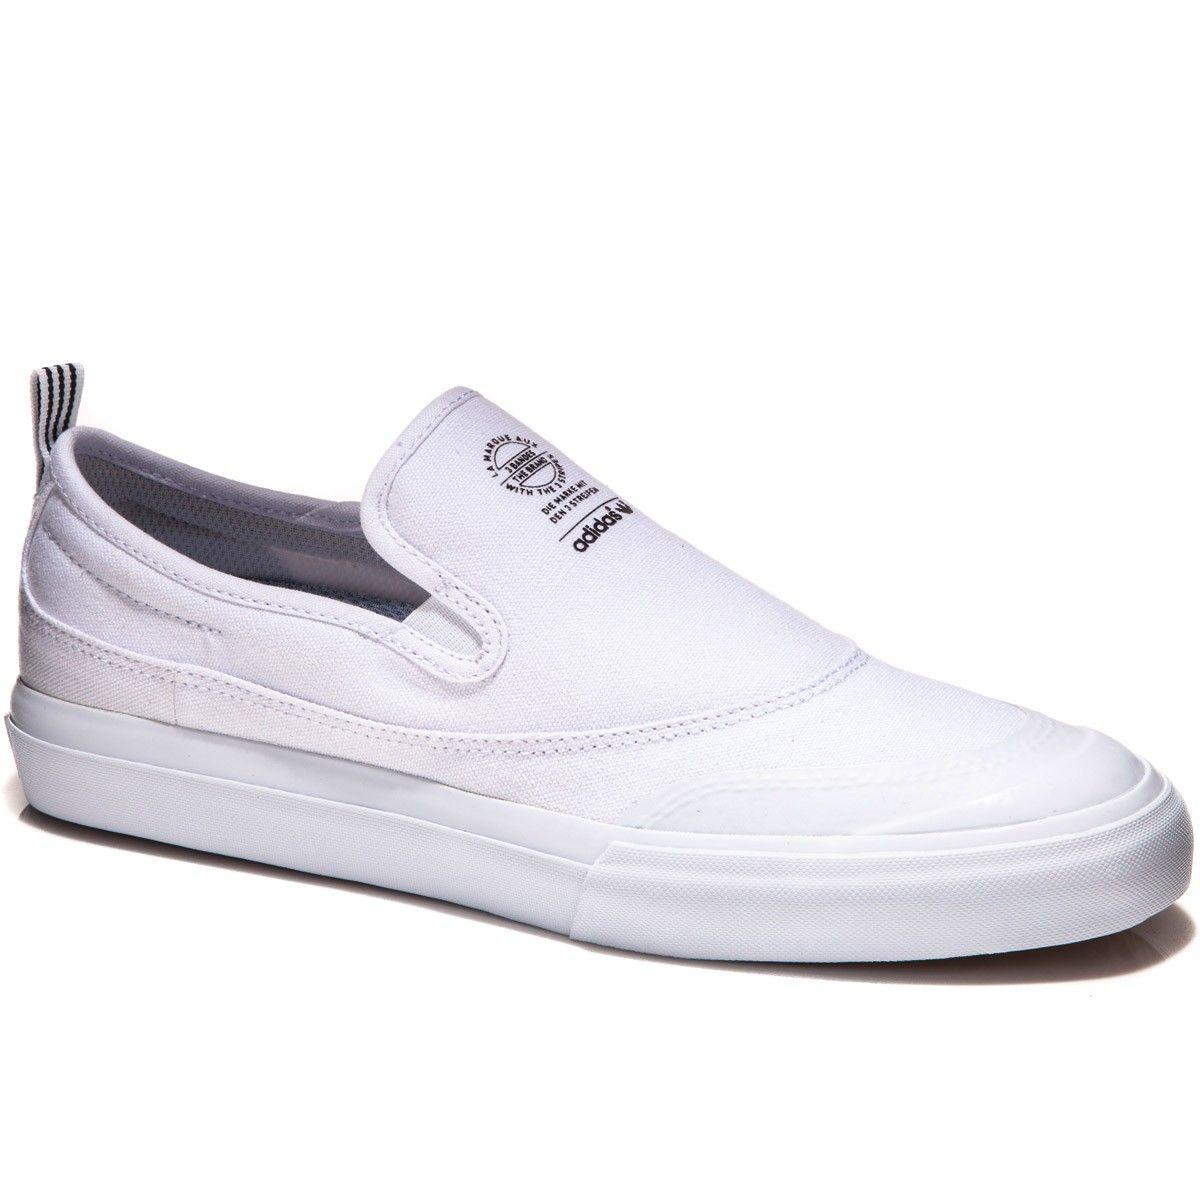 ADIDAS Matchcourt Slip (NEW) (white) sz: 8